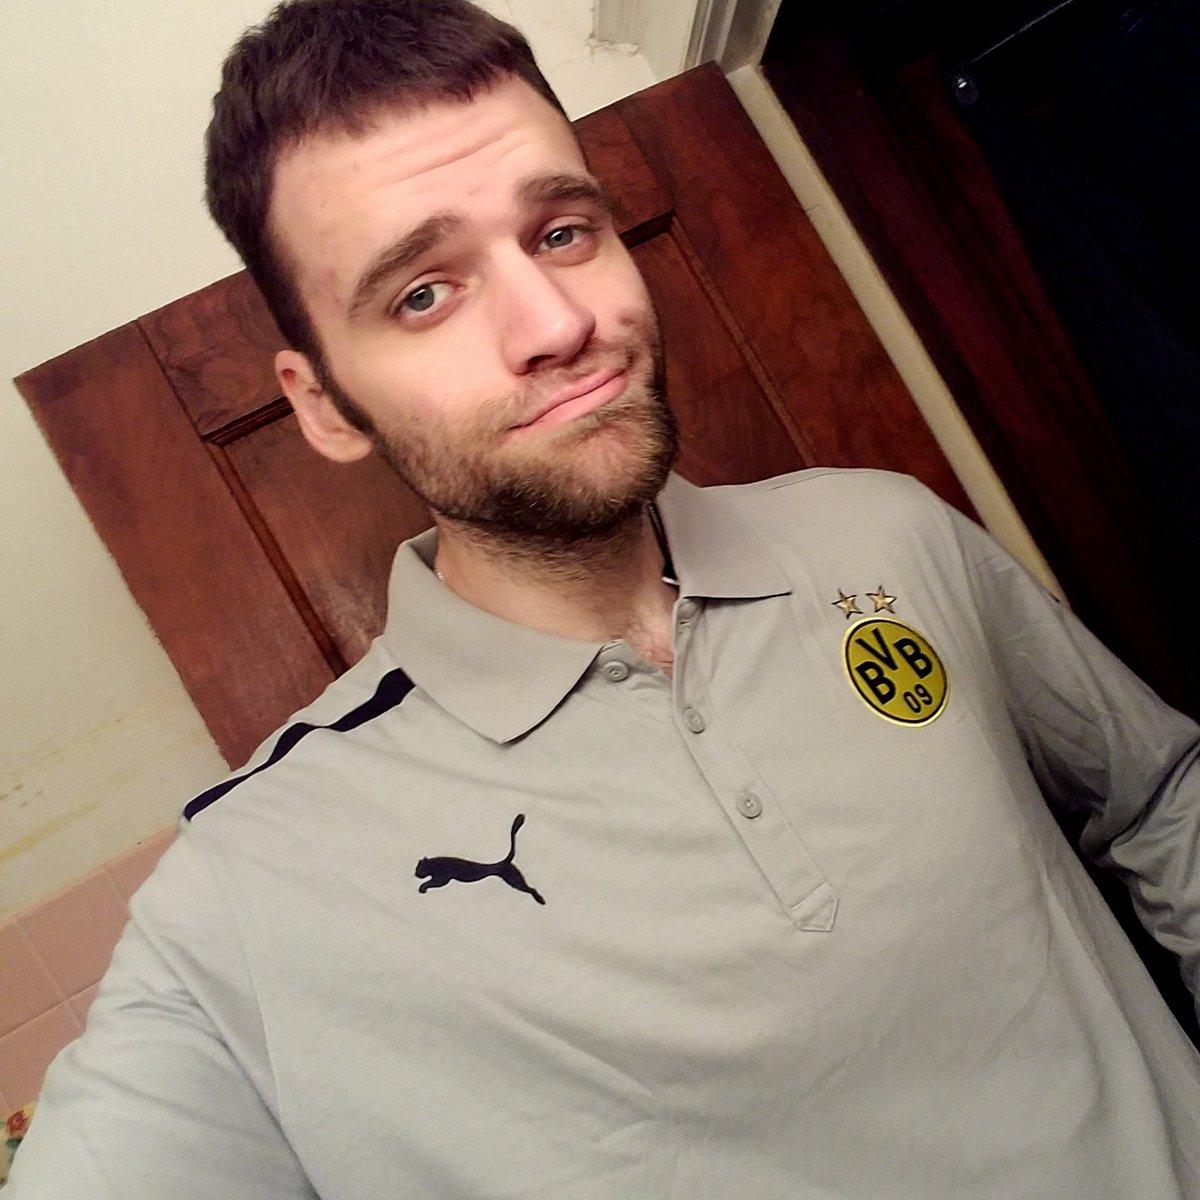 Thank you so much @classicshirts you&#39;re the best!!!  #bvb #borussiadortmund #bvb09 #borussia #dortmund #hejabvb #echteliebe #ynwa<br>http://pic.twitter.com/zveAA5c0Lj